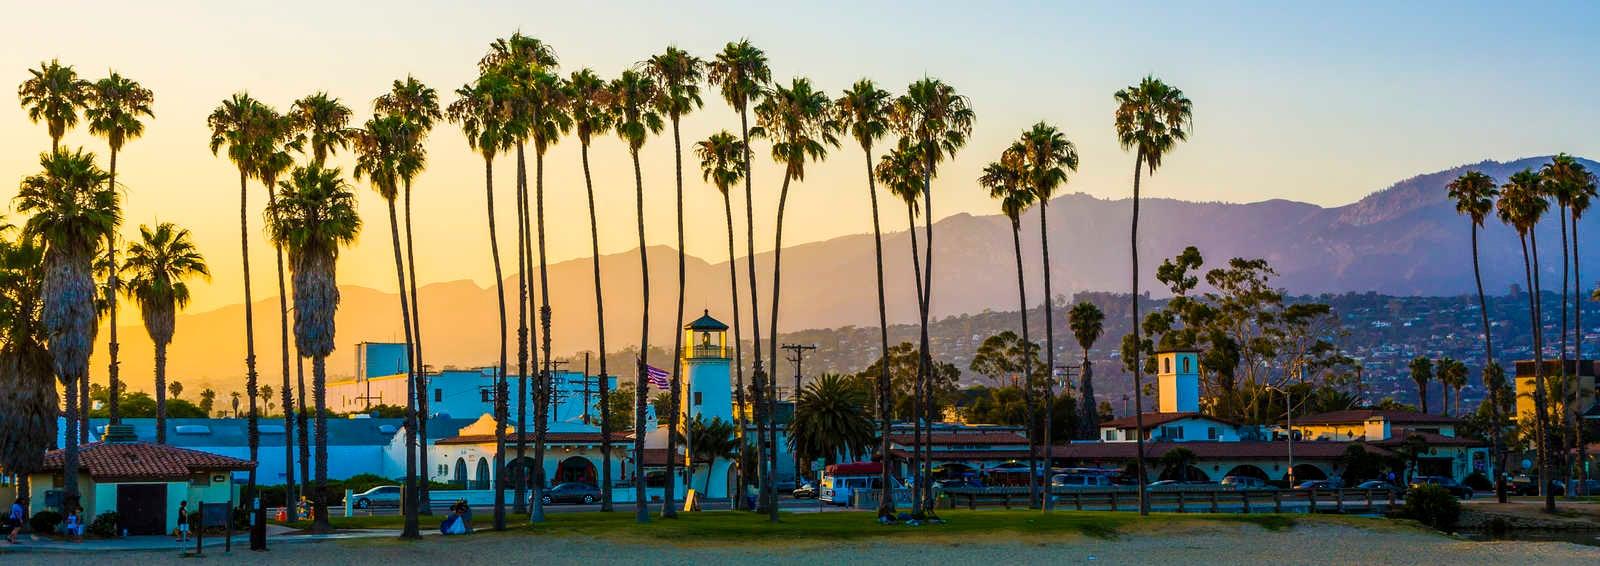 Santa Barbara in sunset